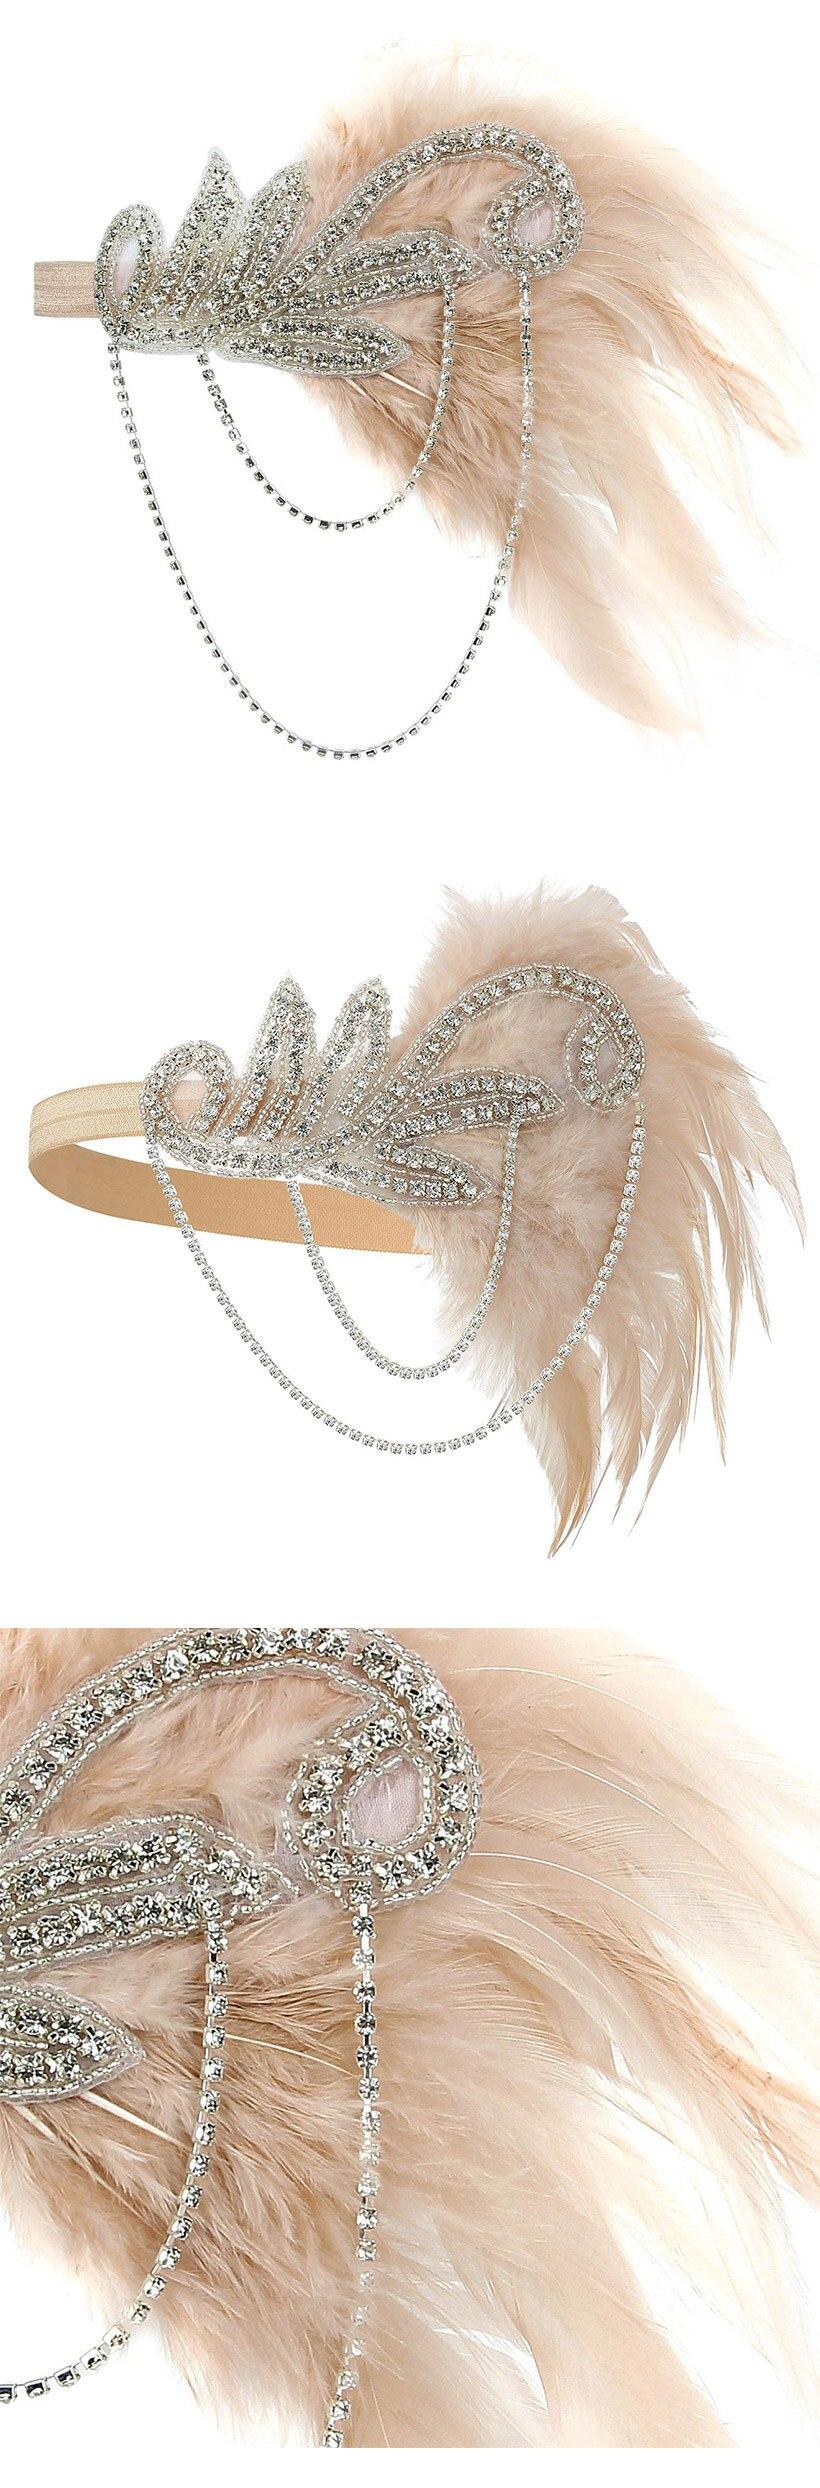 20s Headpiece Vintage 1920s Headband Flapper Great Gatsby (1)